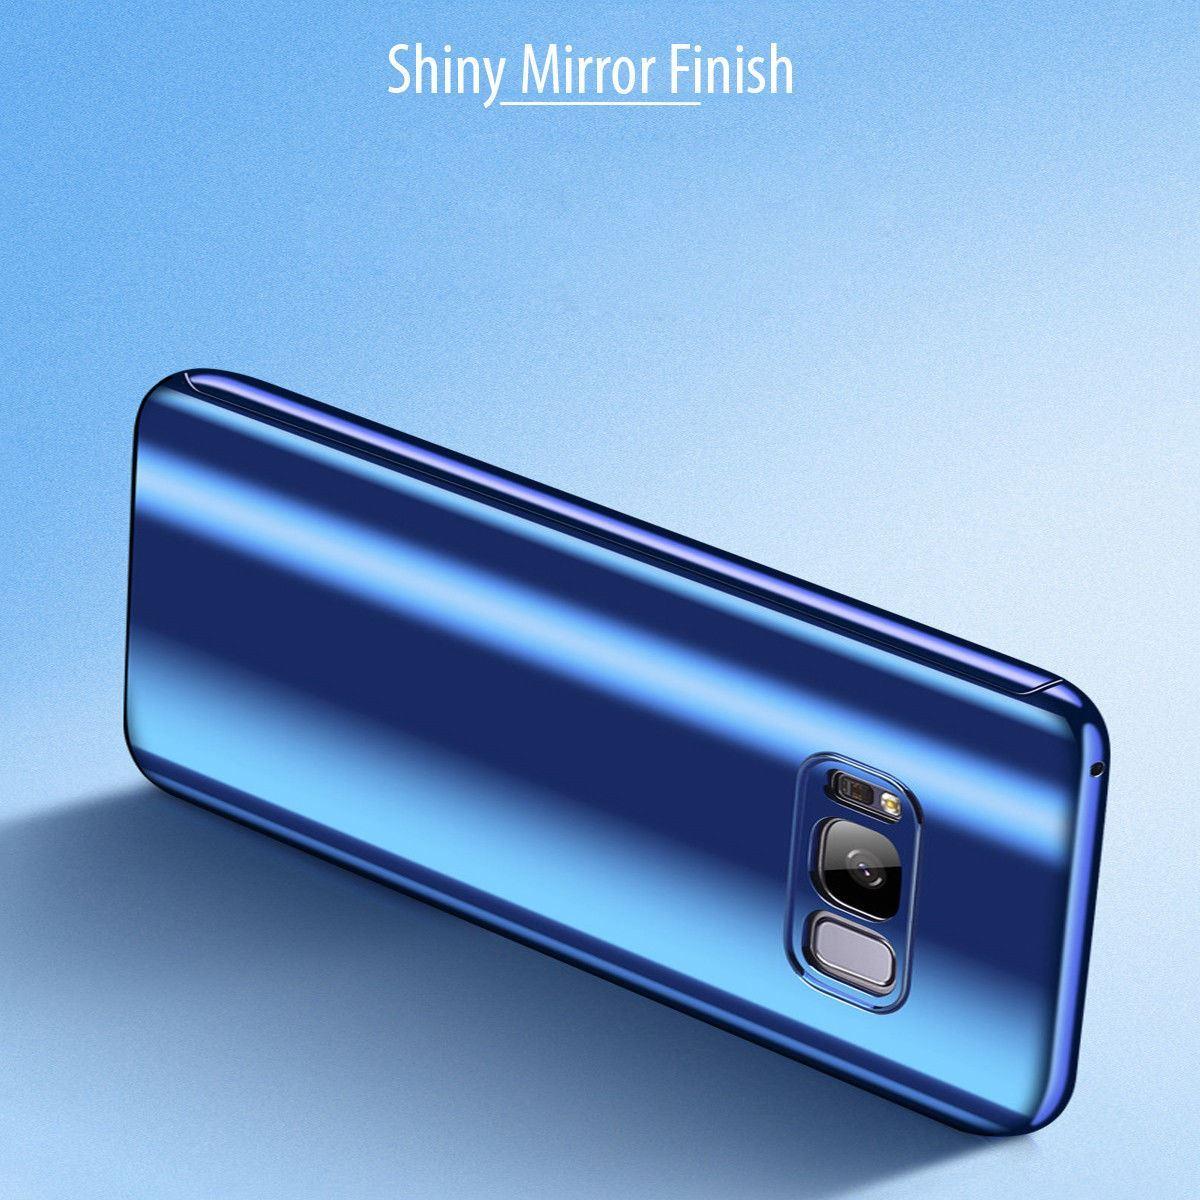 Shockproof-Hybrid-360-Ultra-Thin-Mirror-Hard-Case-Samsung-Galaxy-S7-edge-S8-S9 thumbnail 56